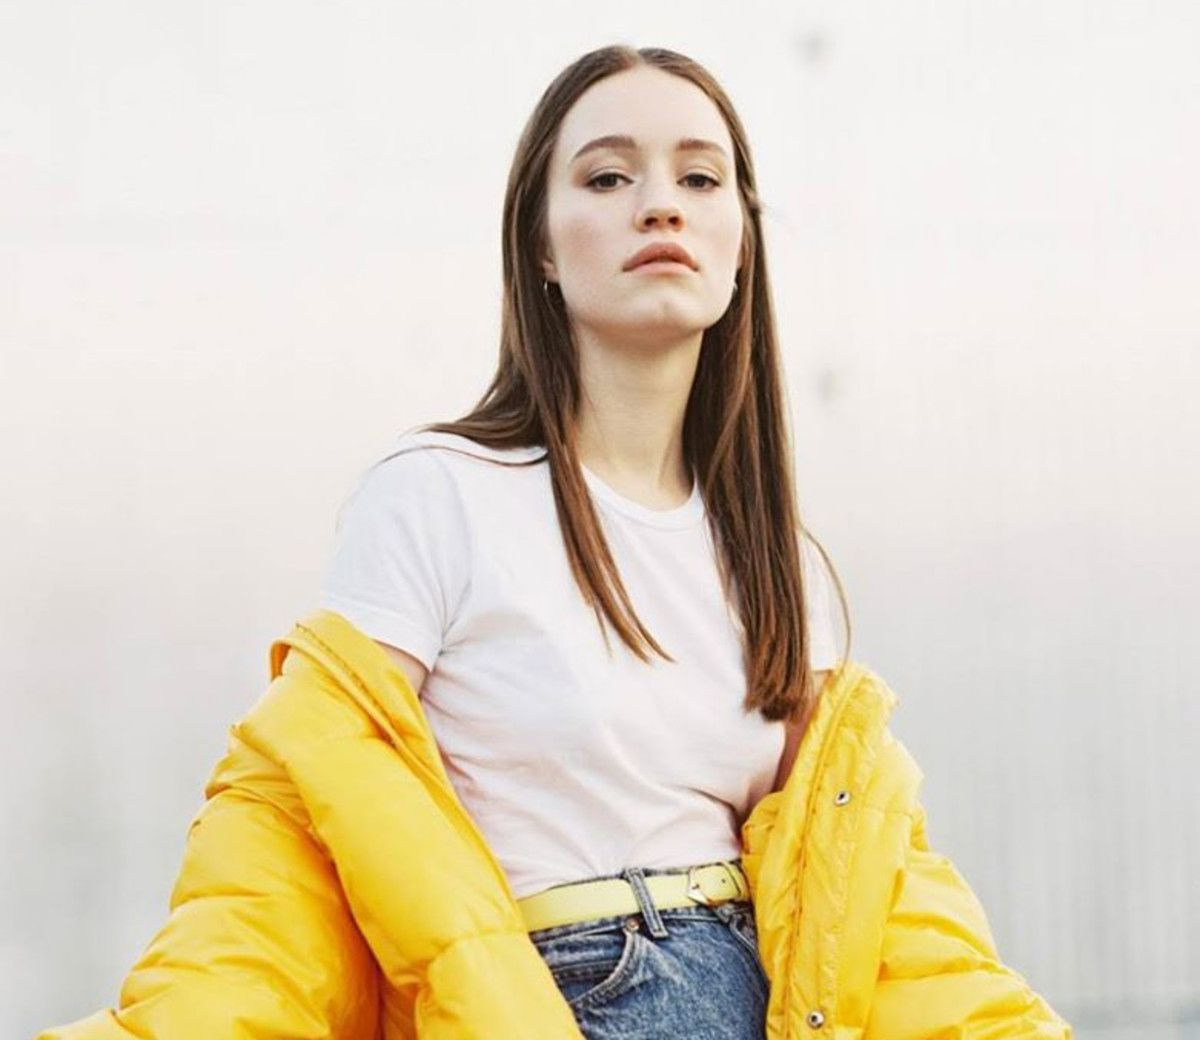 Sigrid S Debut Single Don T Kill My Vibe Is A Scandinavian Pop Gem Pigeonsandplanes Kjendiser